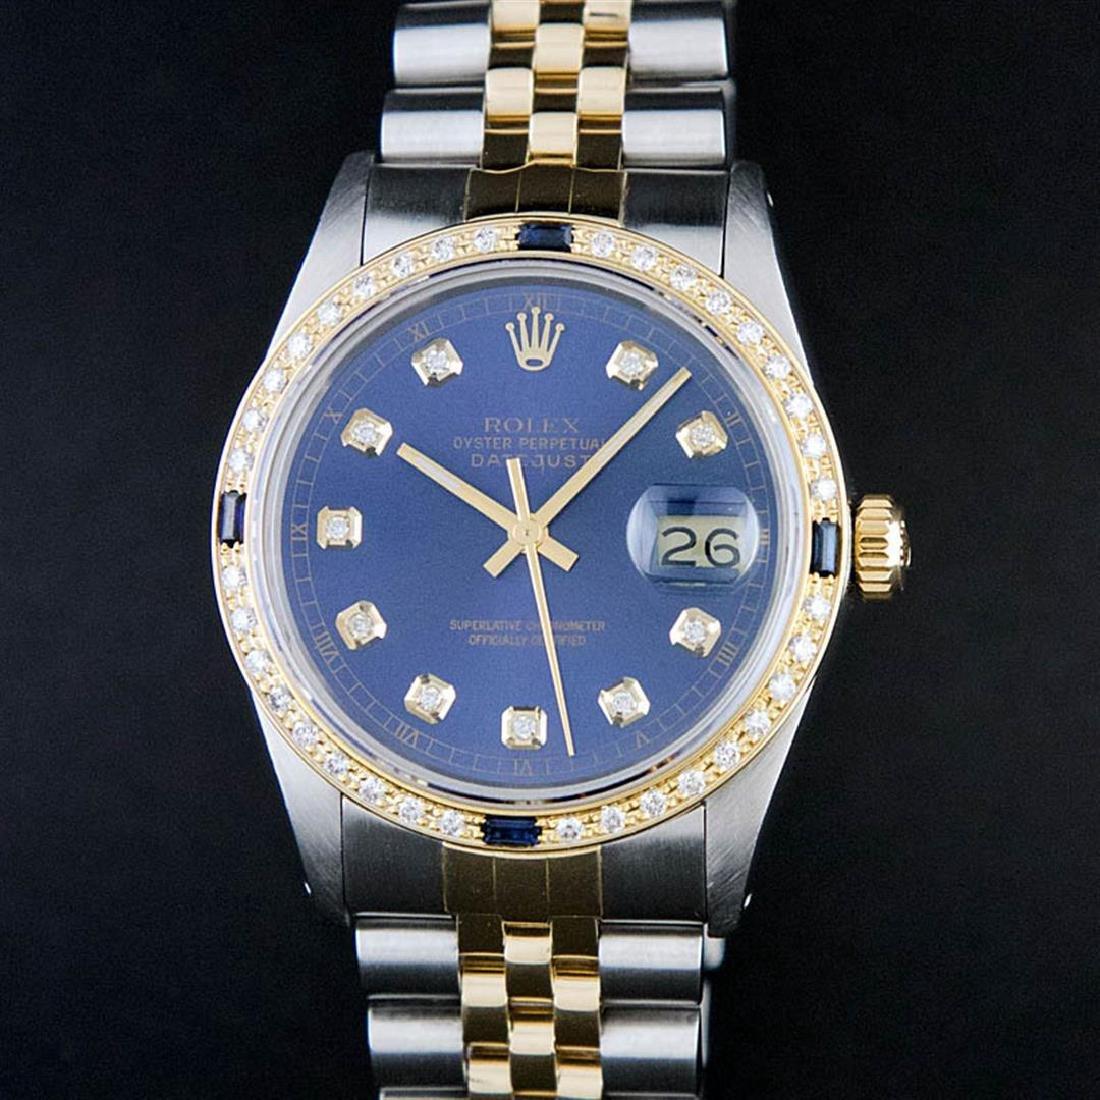 Rolex Two-Tone Diamond and Sapphire DateJust Men's